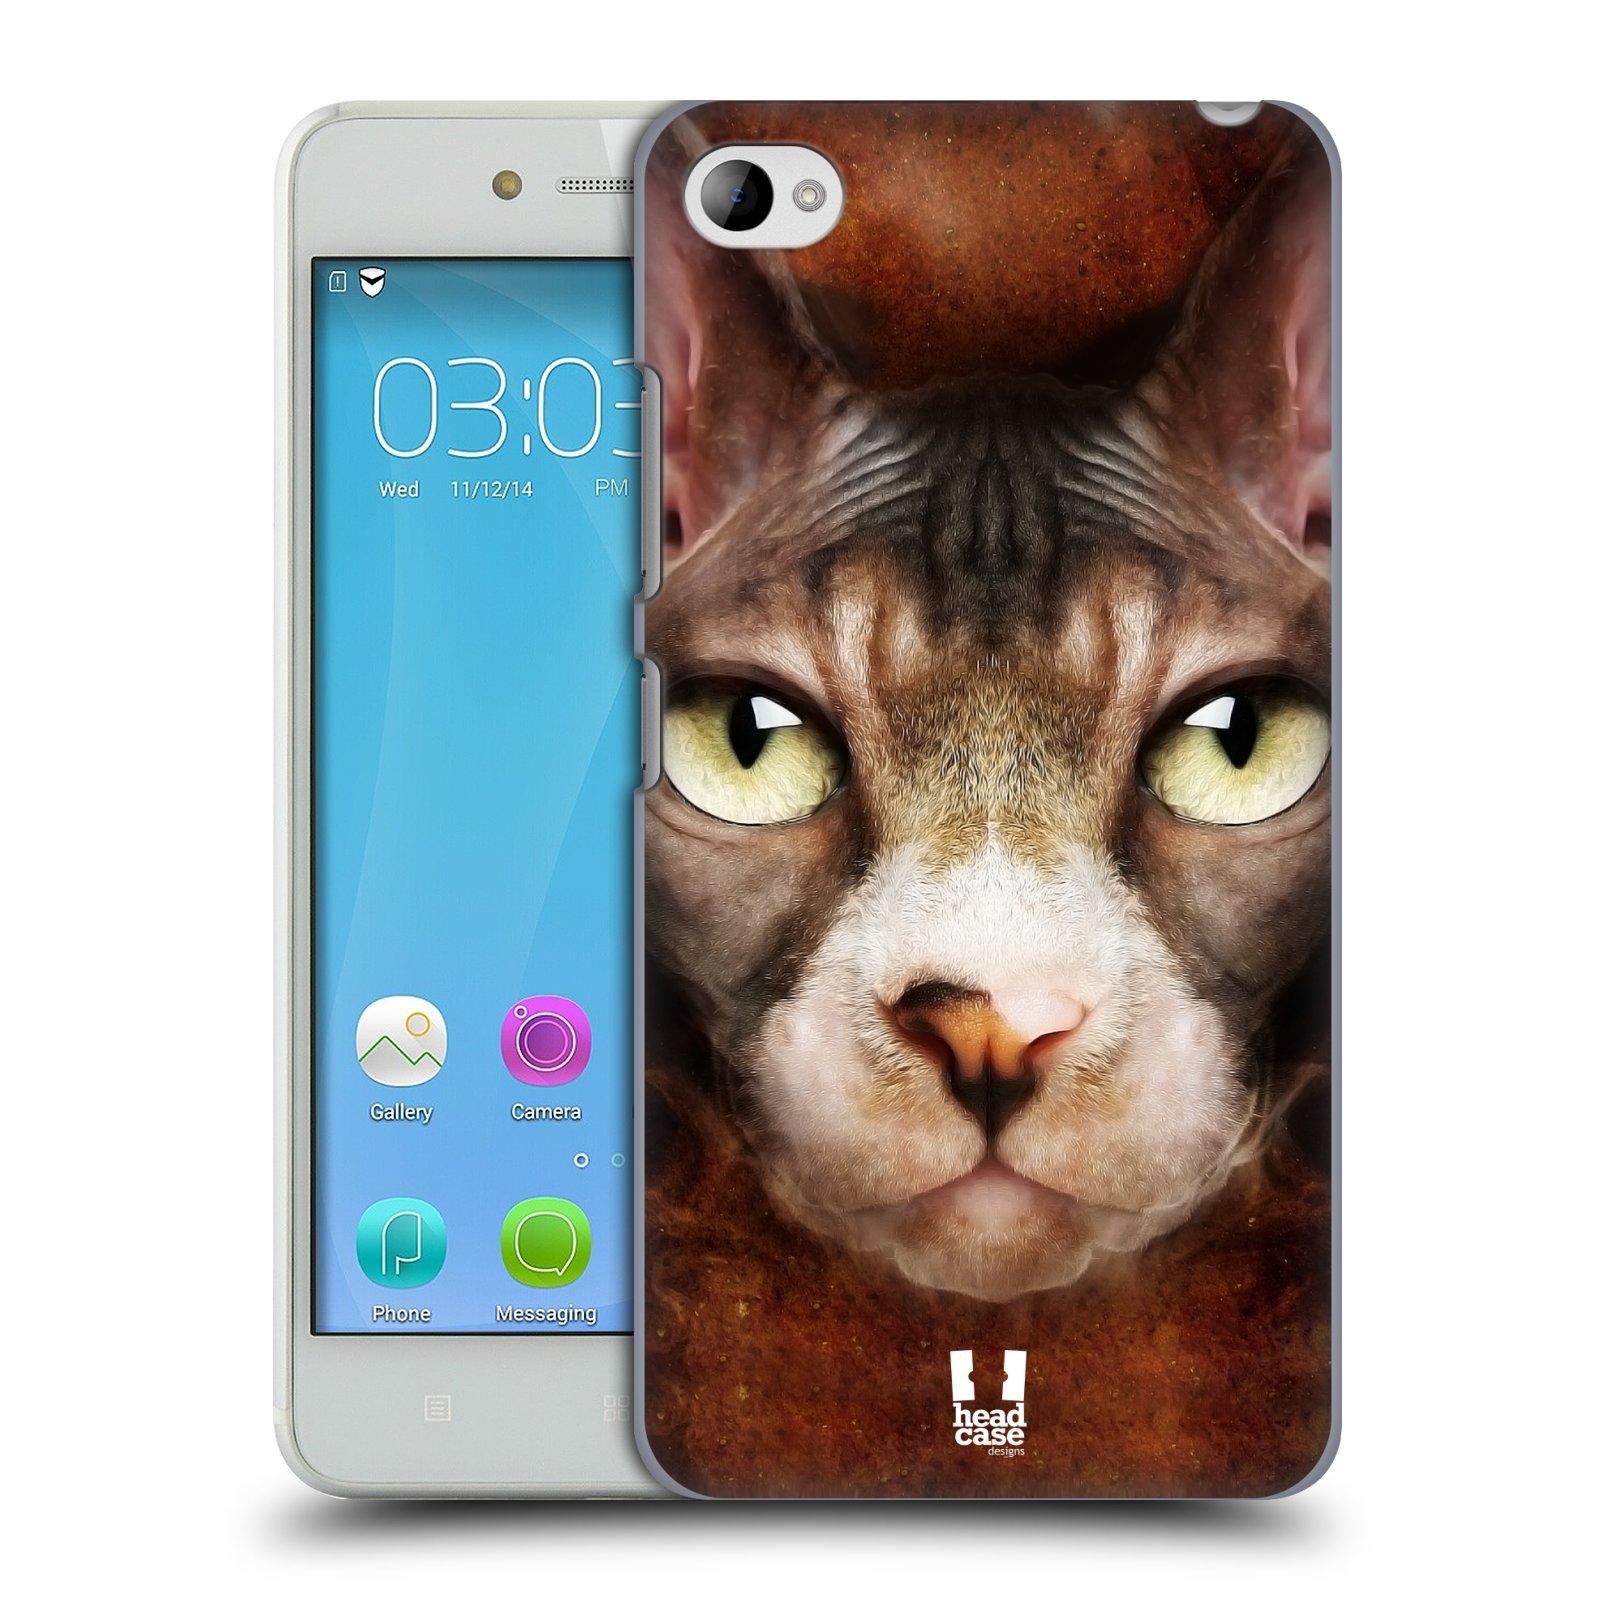 HEAD CASE pevný plastový obal na mobil LENOVO S90 vzor Zvířecí tváře kočka sphynx